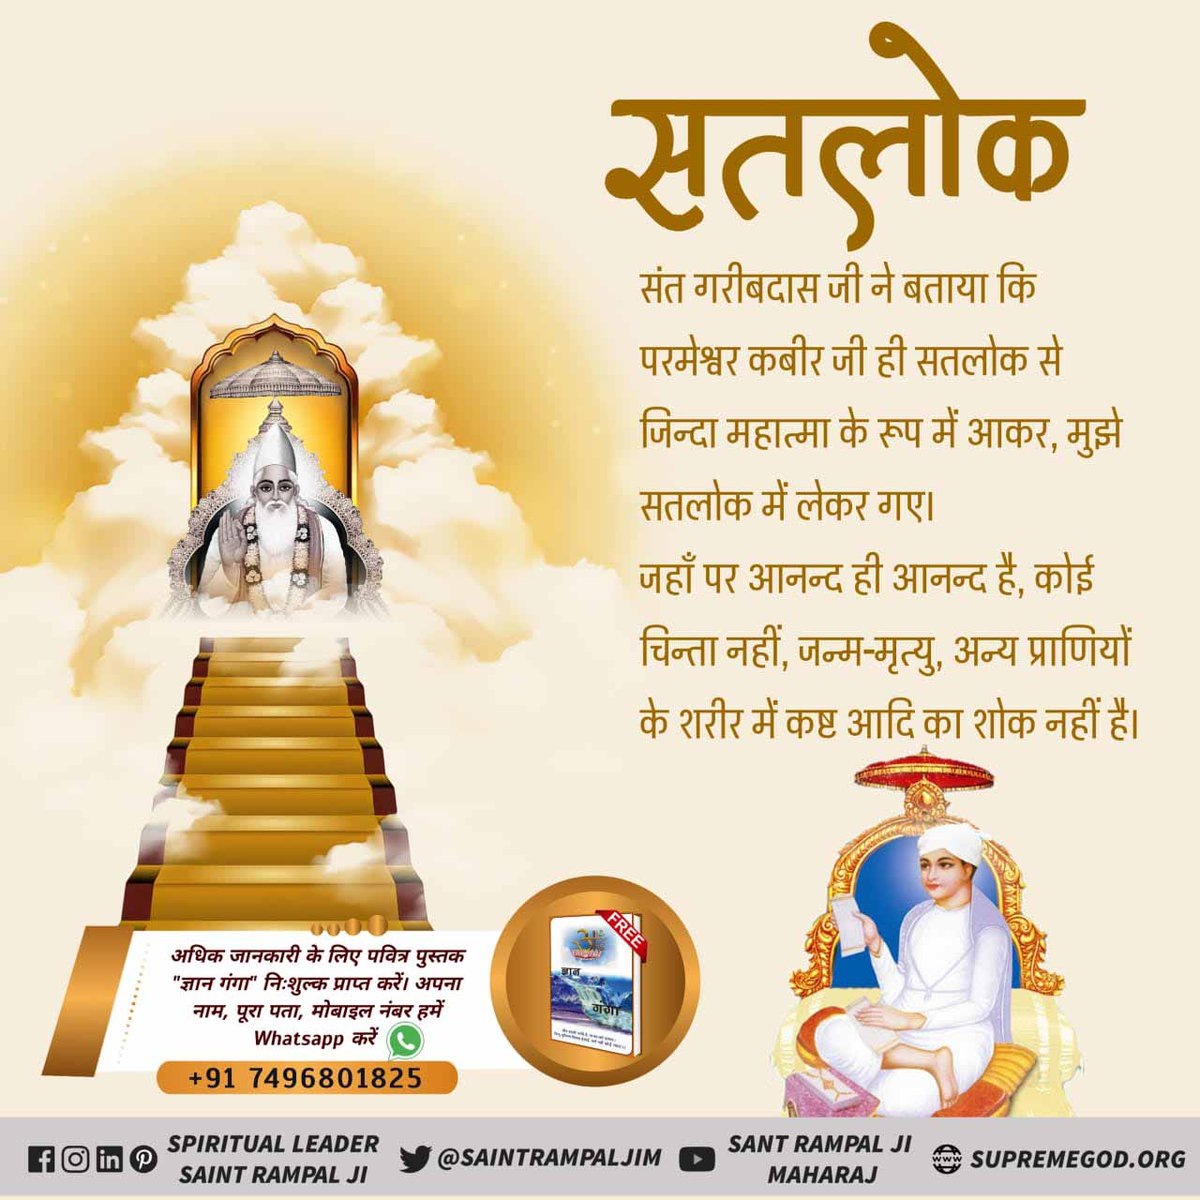 Shri Guru Granth Sahib, Raag Aasavari, Mehla 1 Ehu jeeu bahute janam bharmia, ta Satguru shabd sunaiya Shri Nanak ji says that this soul of mine kept wandering in the cycle of birth & death for a long time. Now the Complete Guru has given me the true Naam  #wednesdaythought